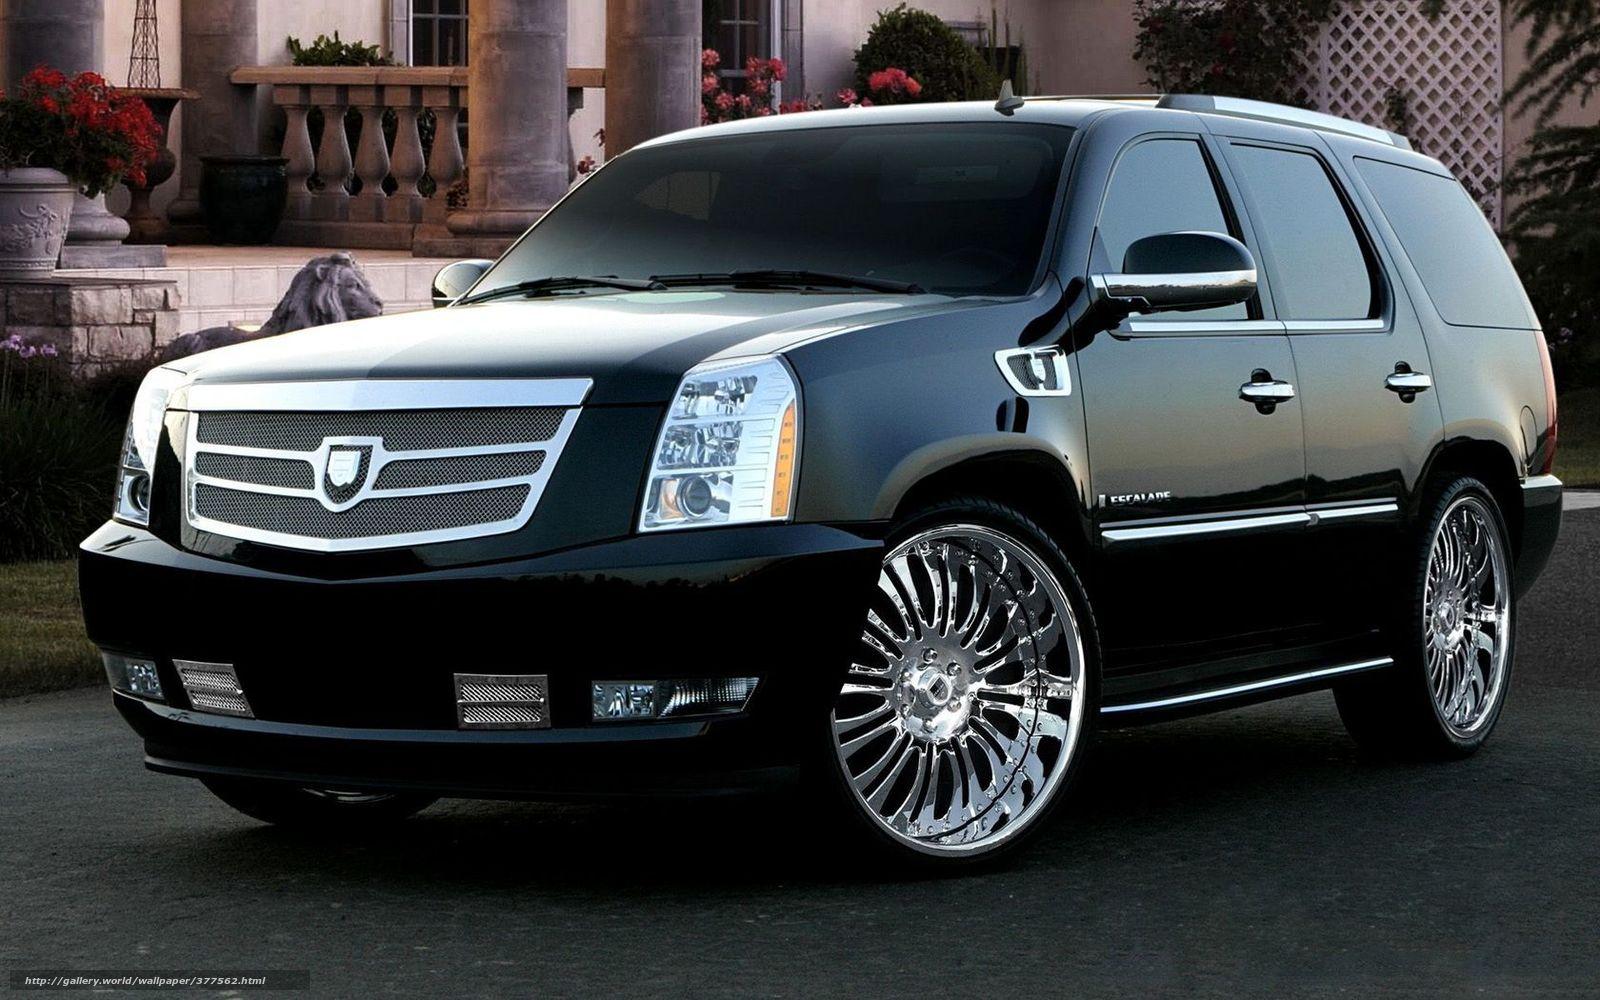 Cadillac Fondos Gratis